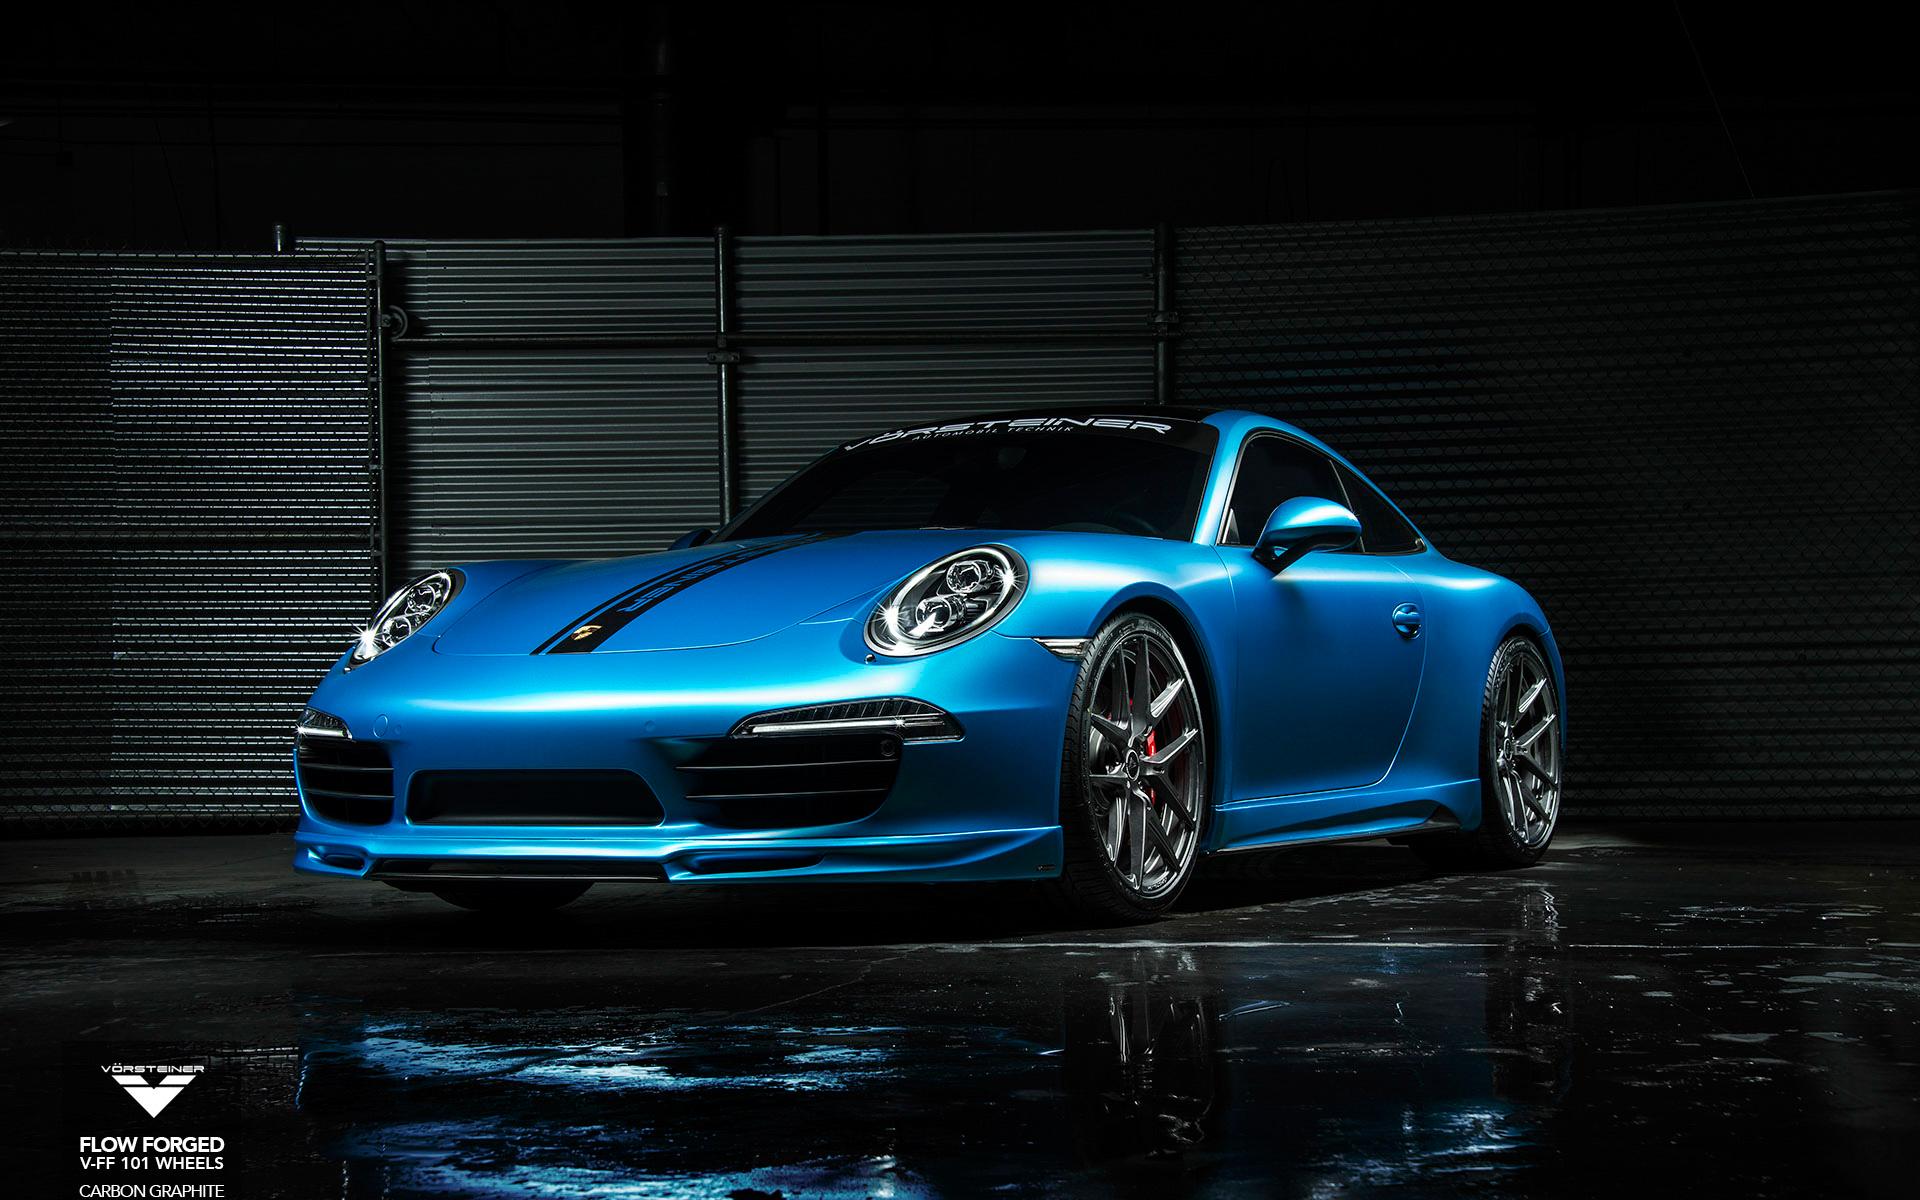 Vorsteiner Porsche 911 Carrera S V Ff 101 Wallpaper Hd Car Wallpapers Id 4994